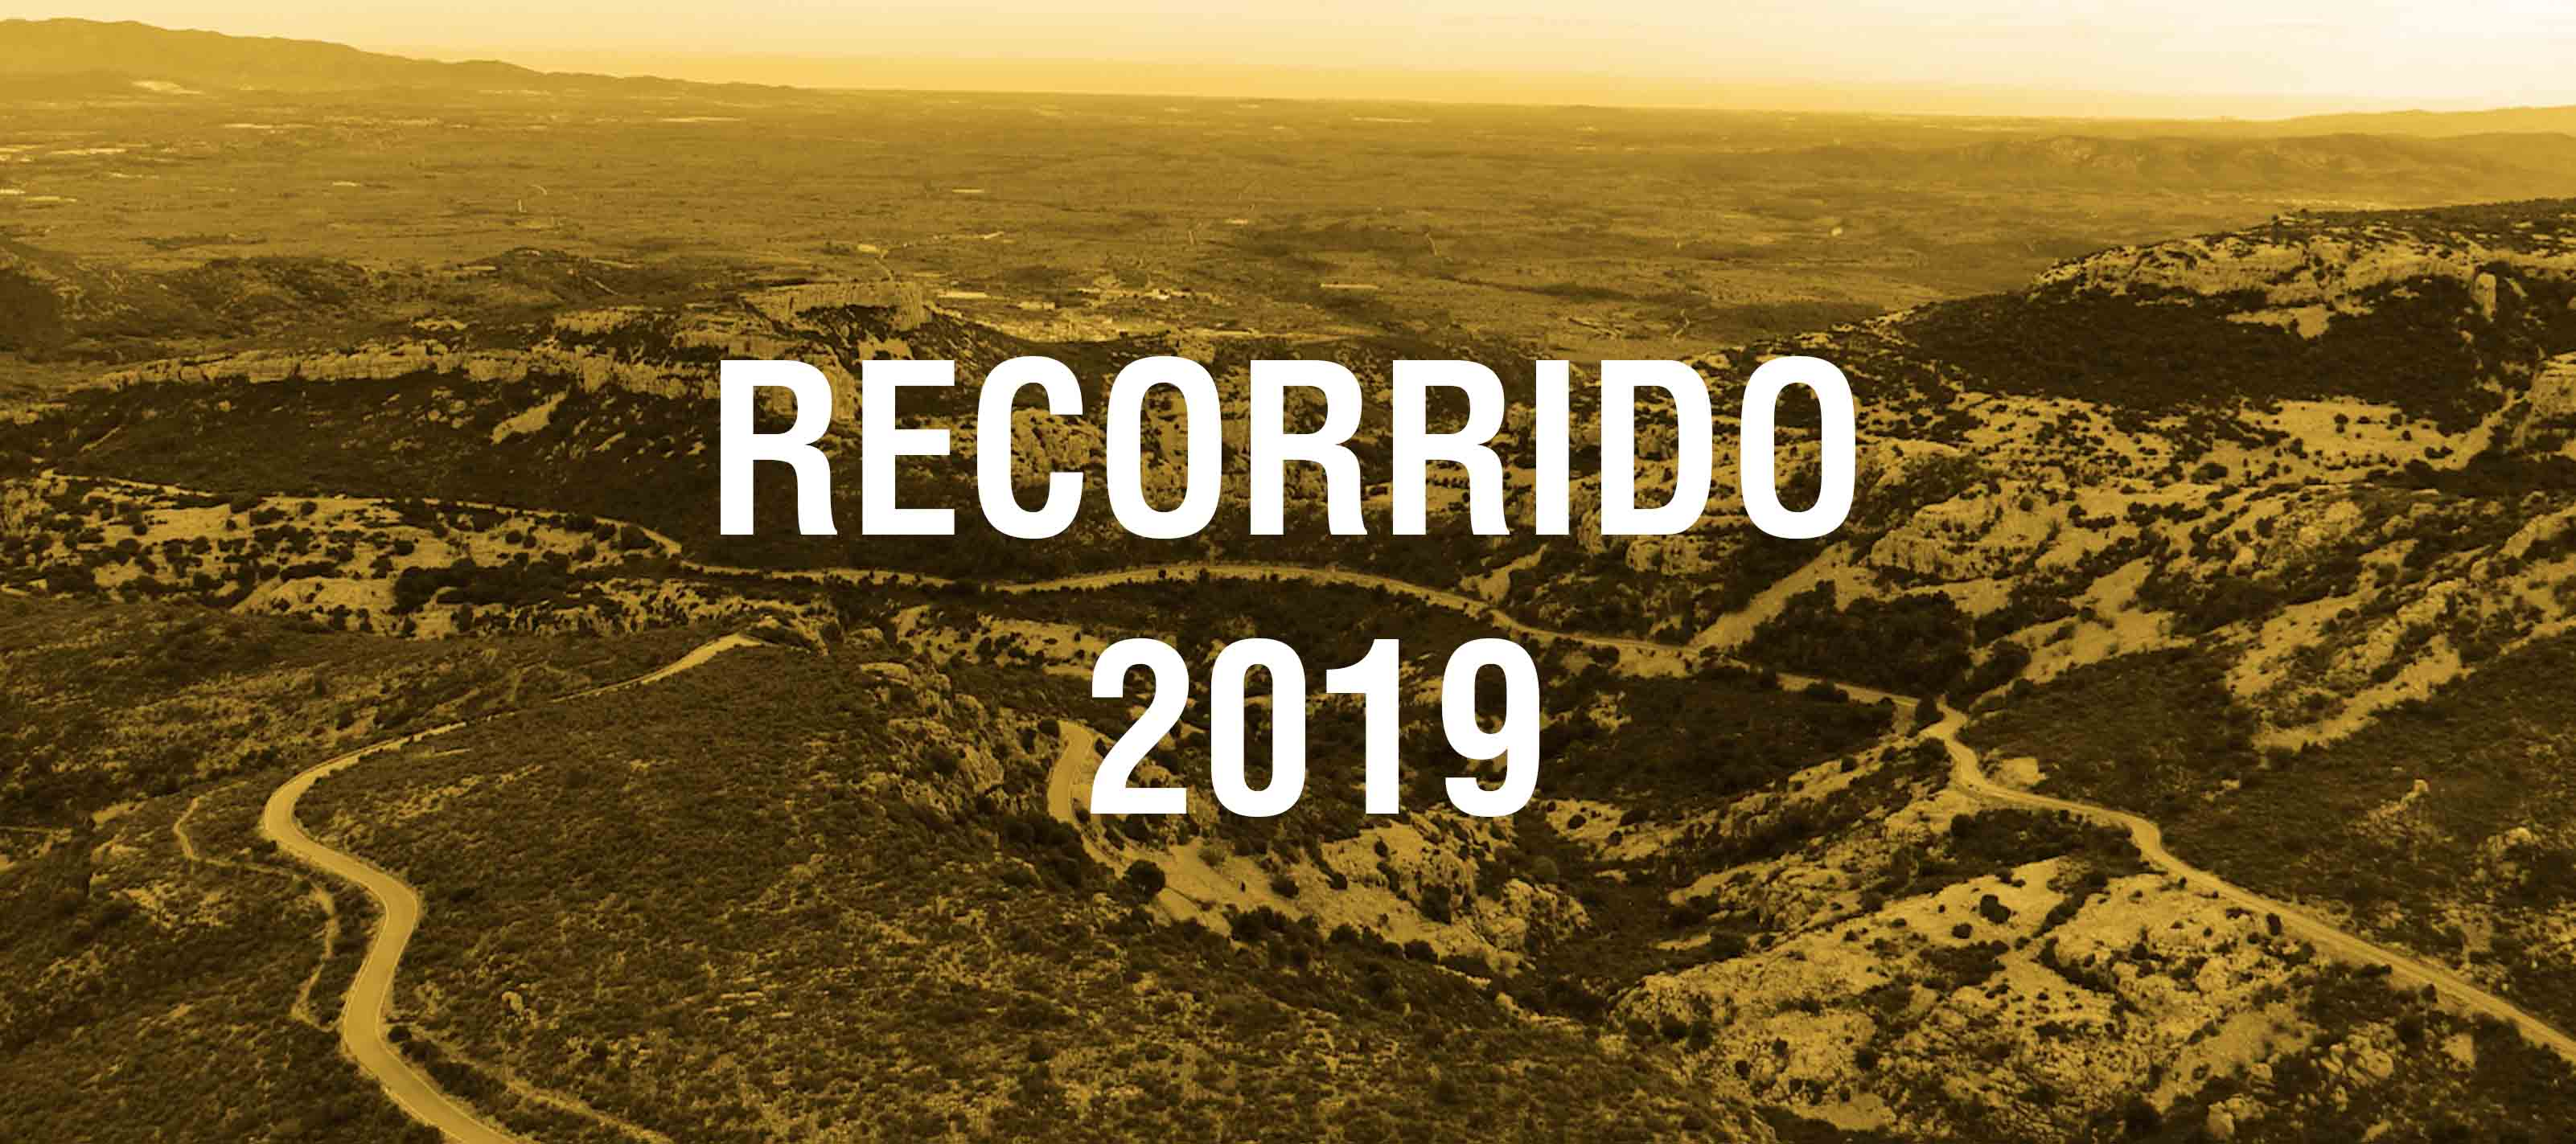 Recorrido Challenge de la Plana 2019